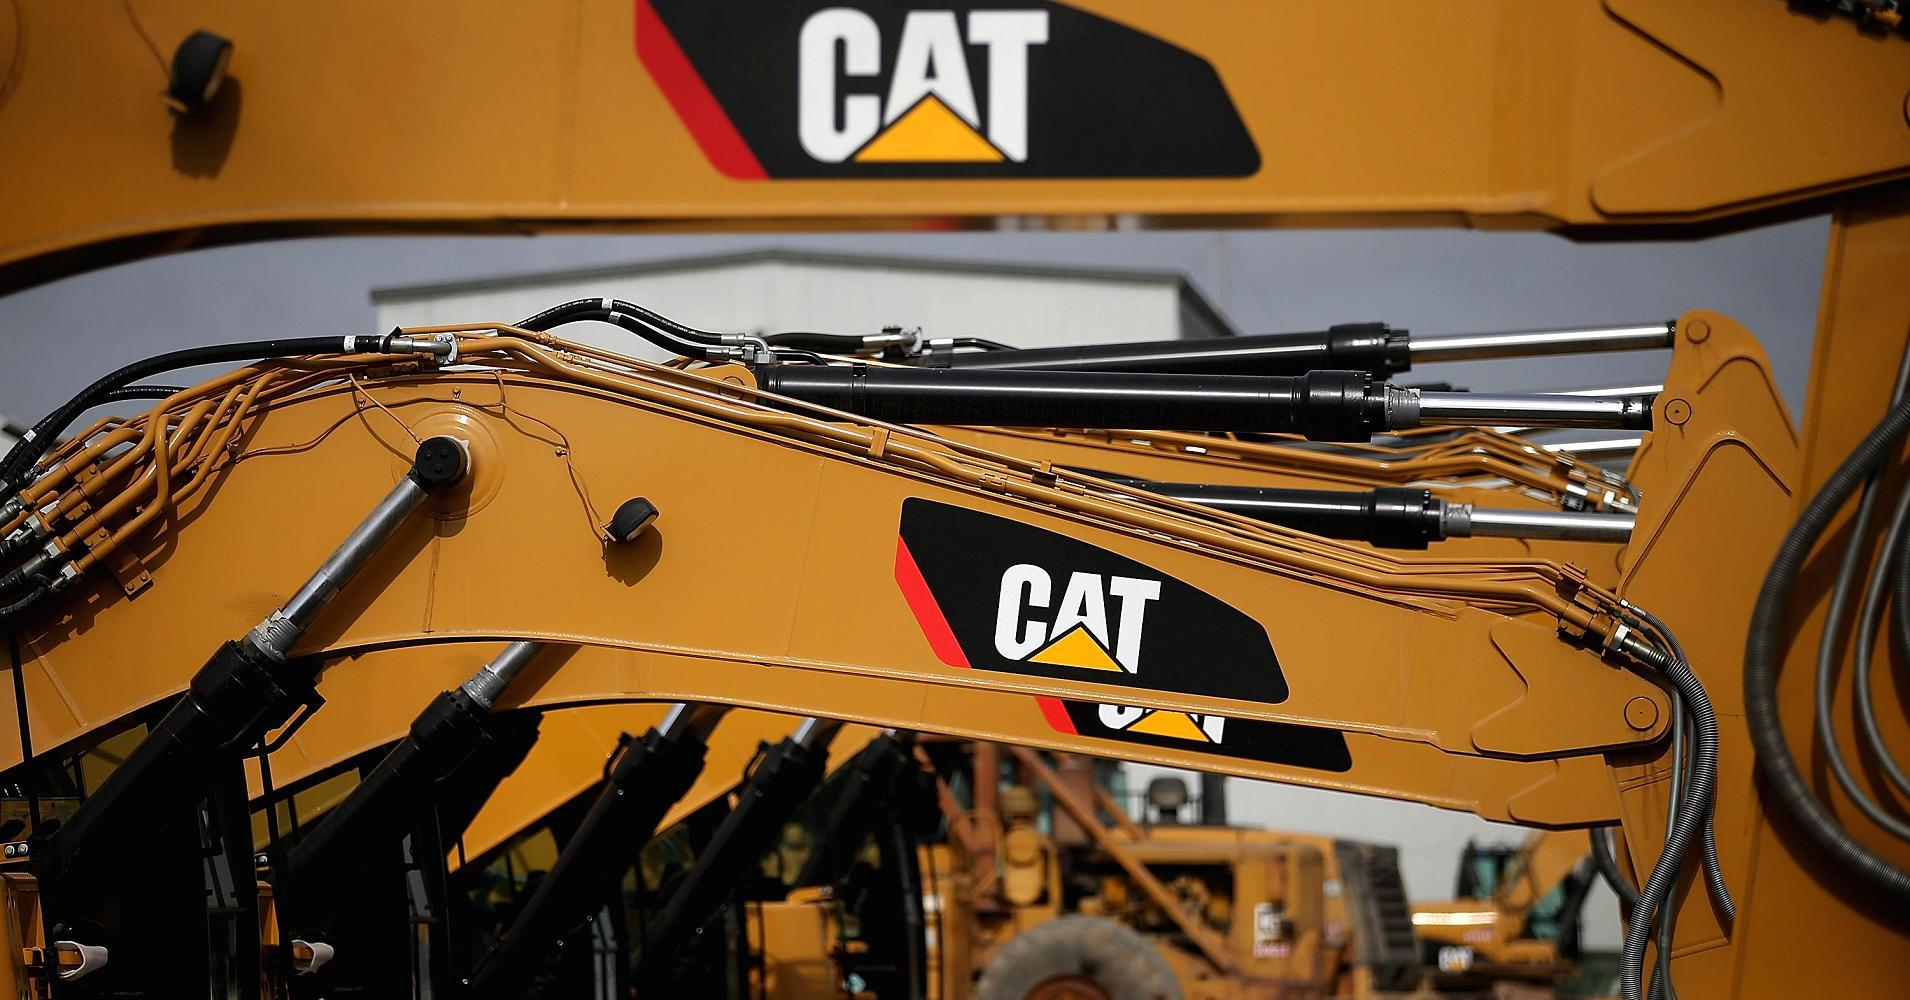 William Blair Analysts Cut Earnings Estimates for Caterpillar Inc. (CAT)